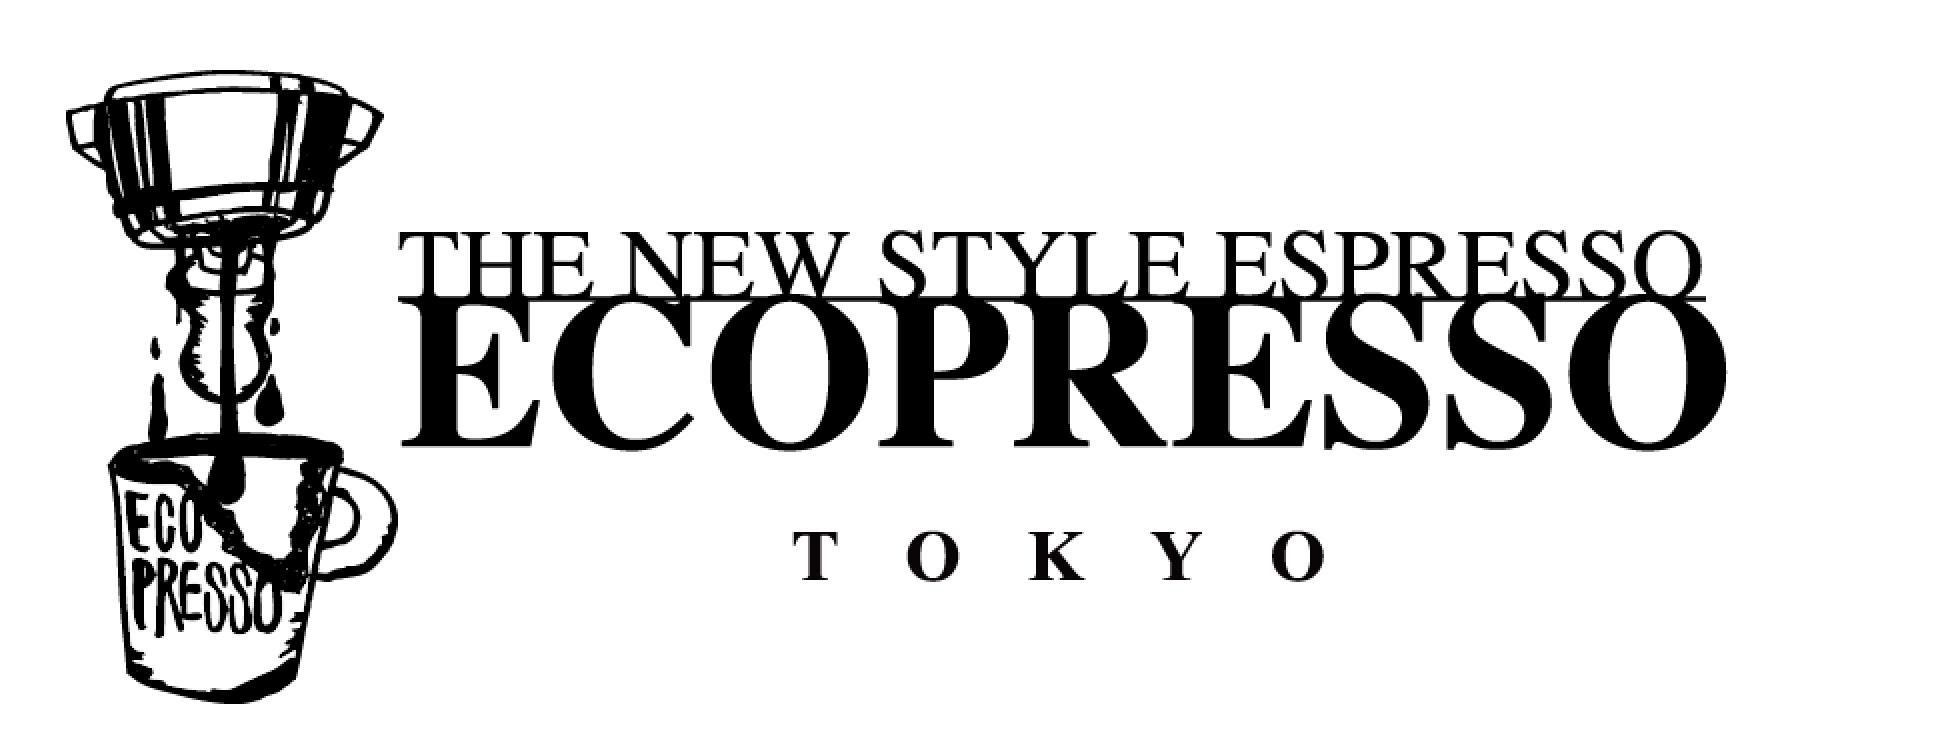 ECOPRESSO TOKYO  がオープン致します!_b0216527_1801316.png